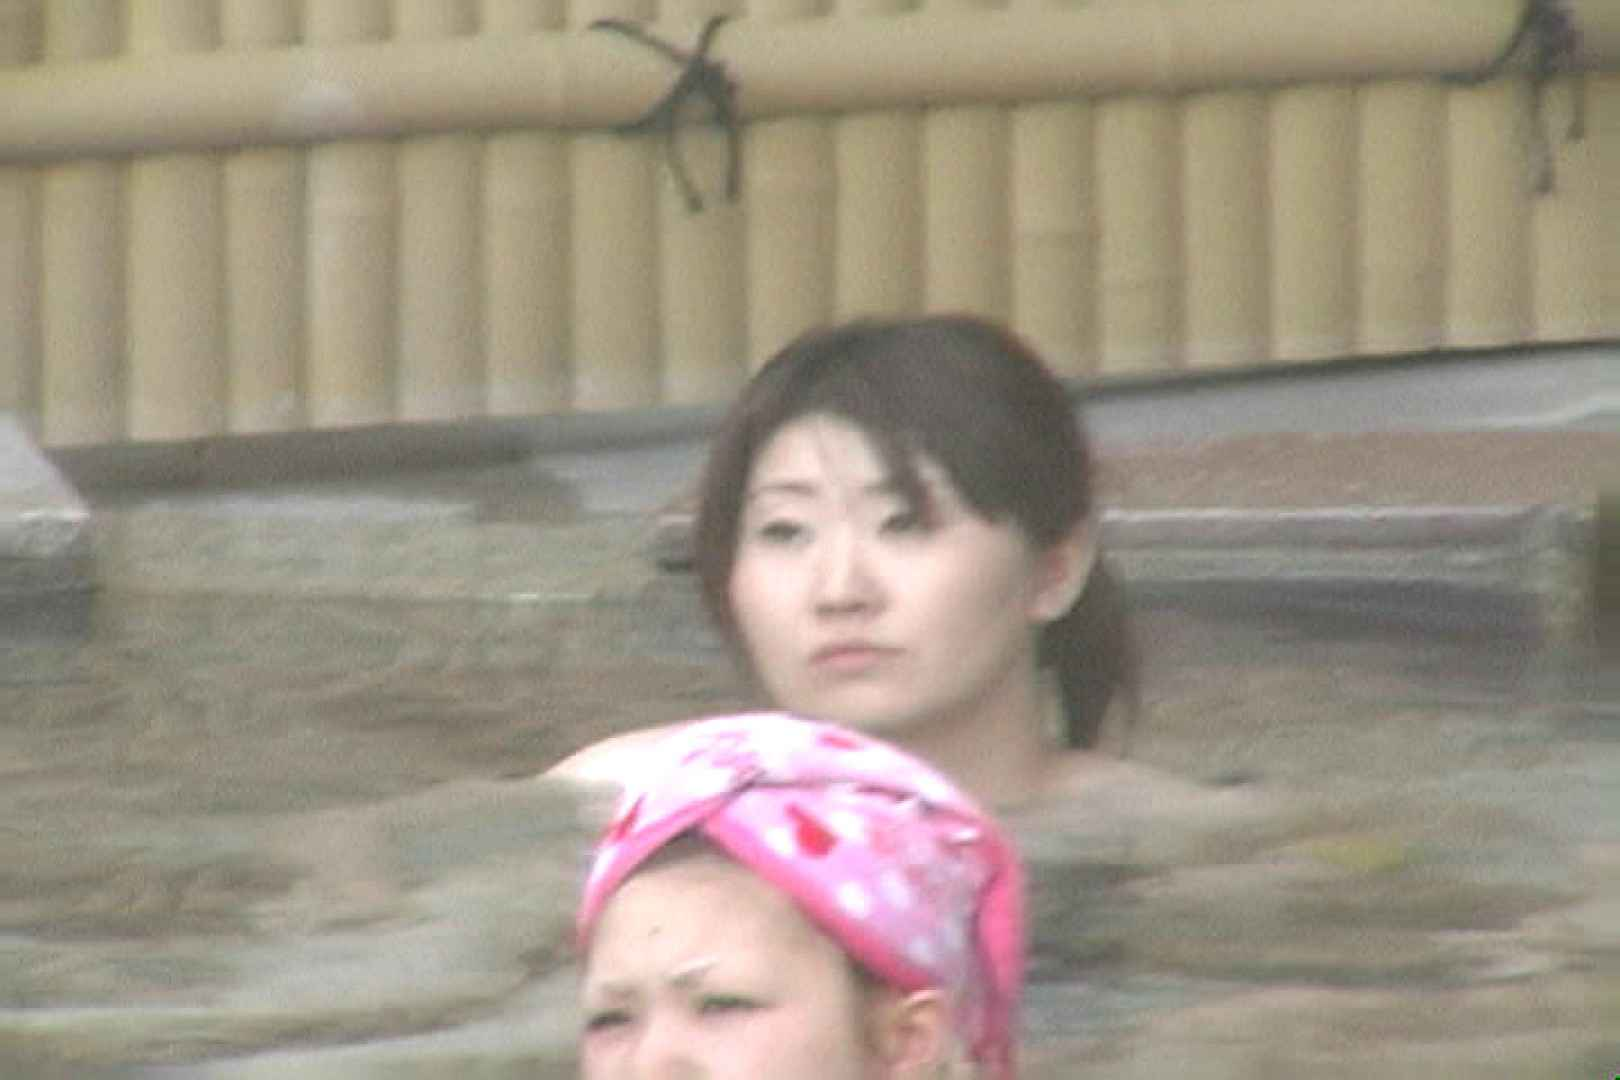 Aquaな露天風呂Vol.25 美しいOLの裸体 おまんこ無修正動画無料 72pic 20